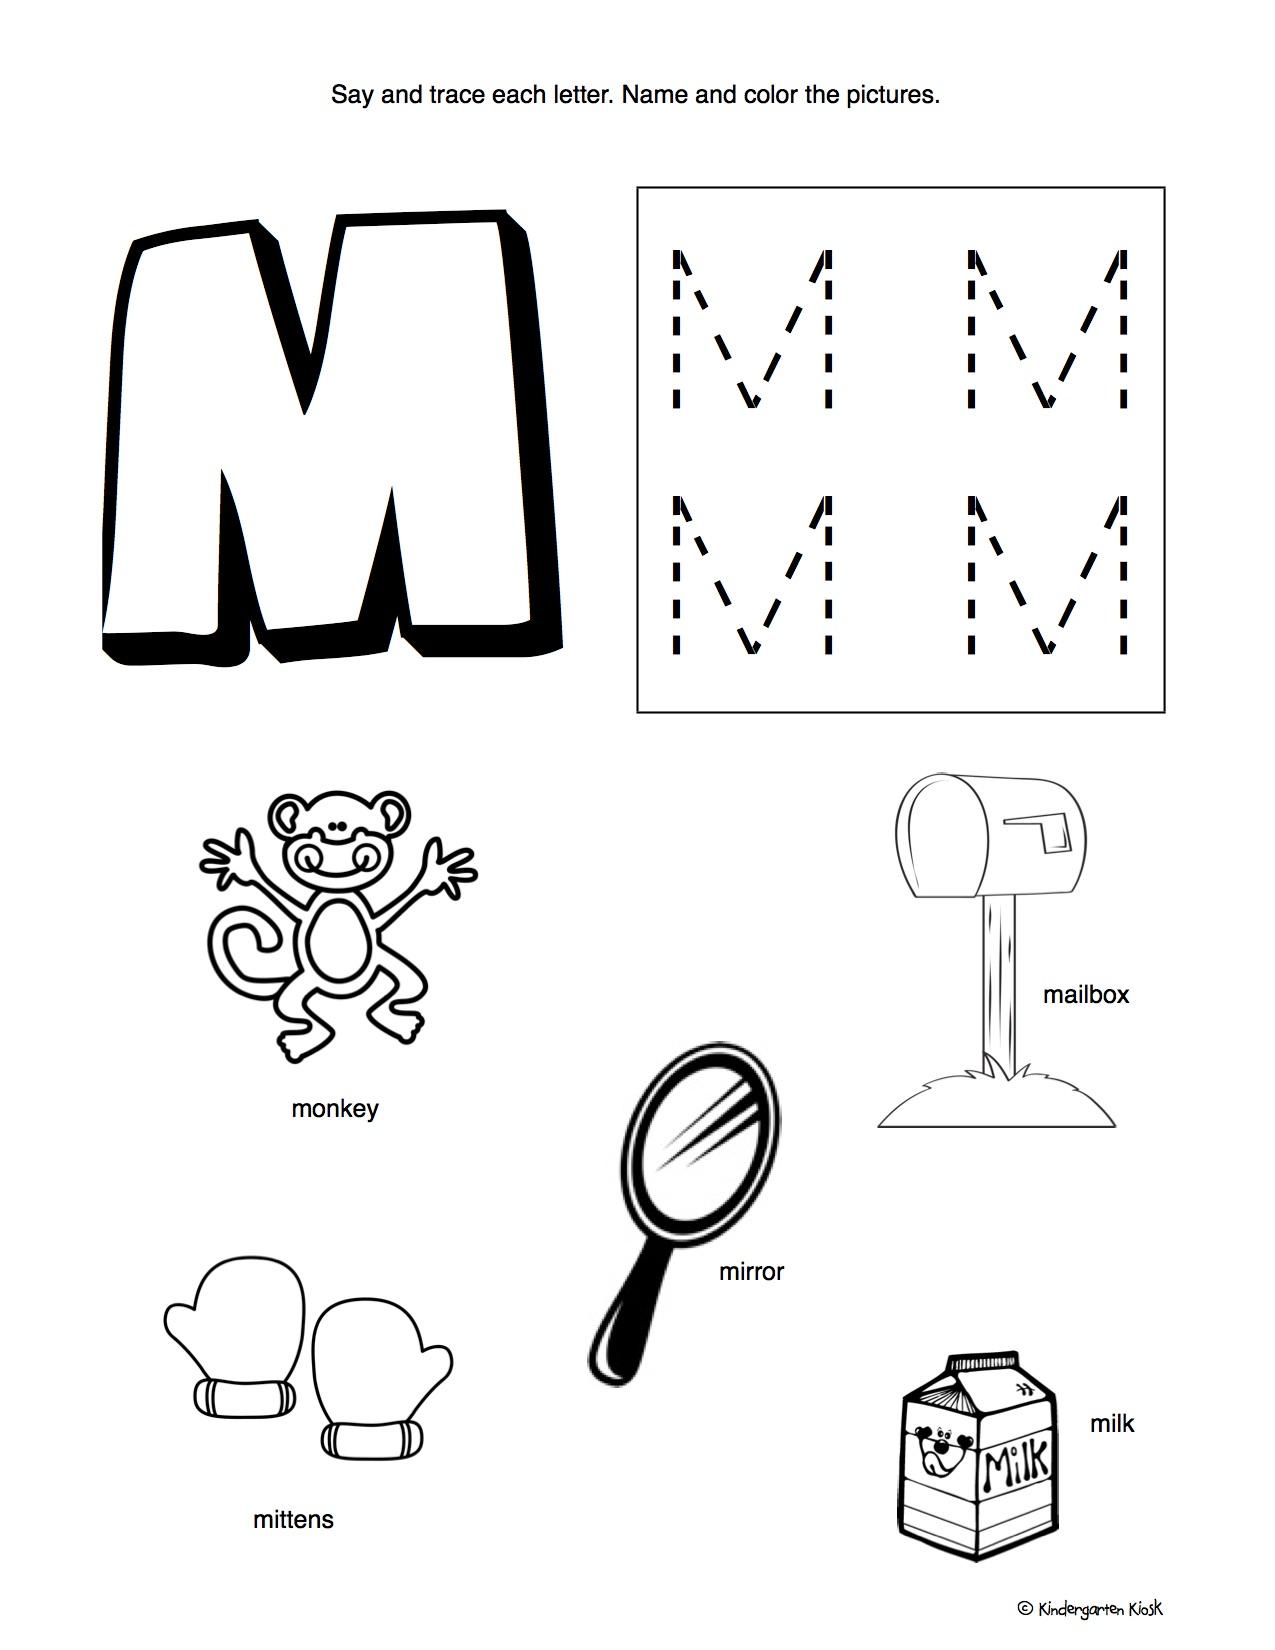 January Preschool Homework Packet — Kindergarten Kiosk